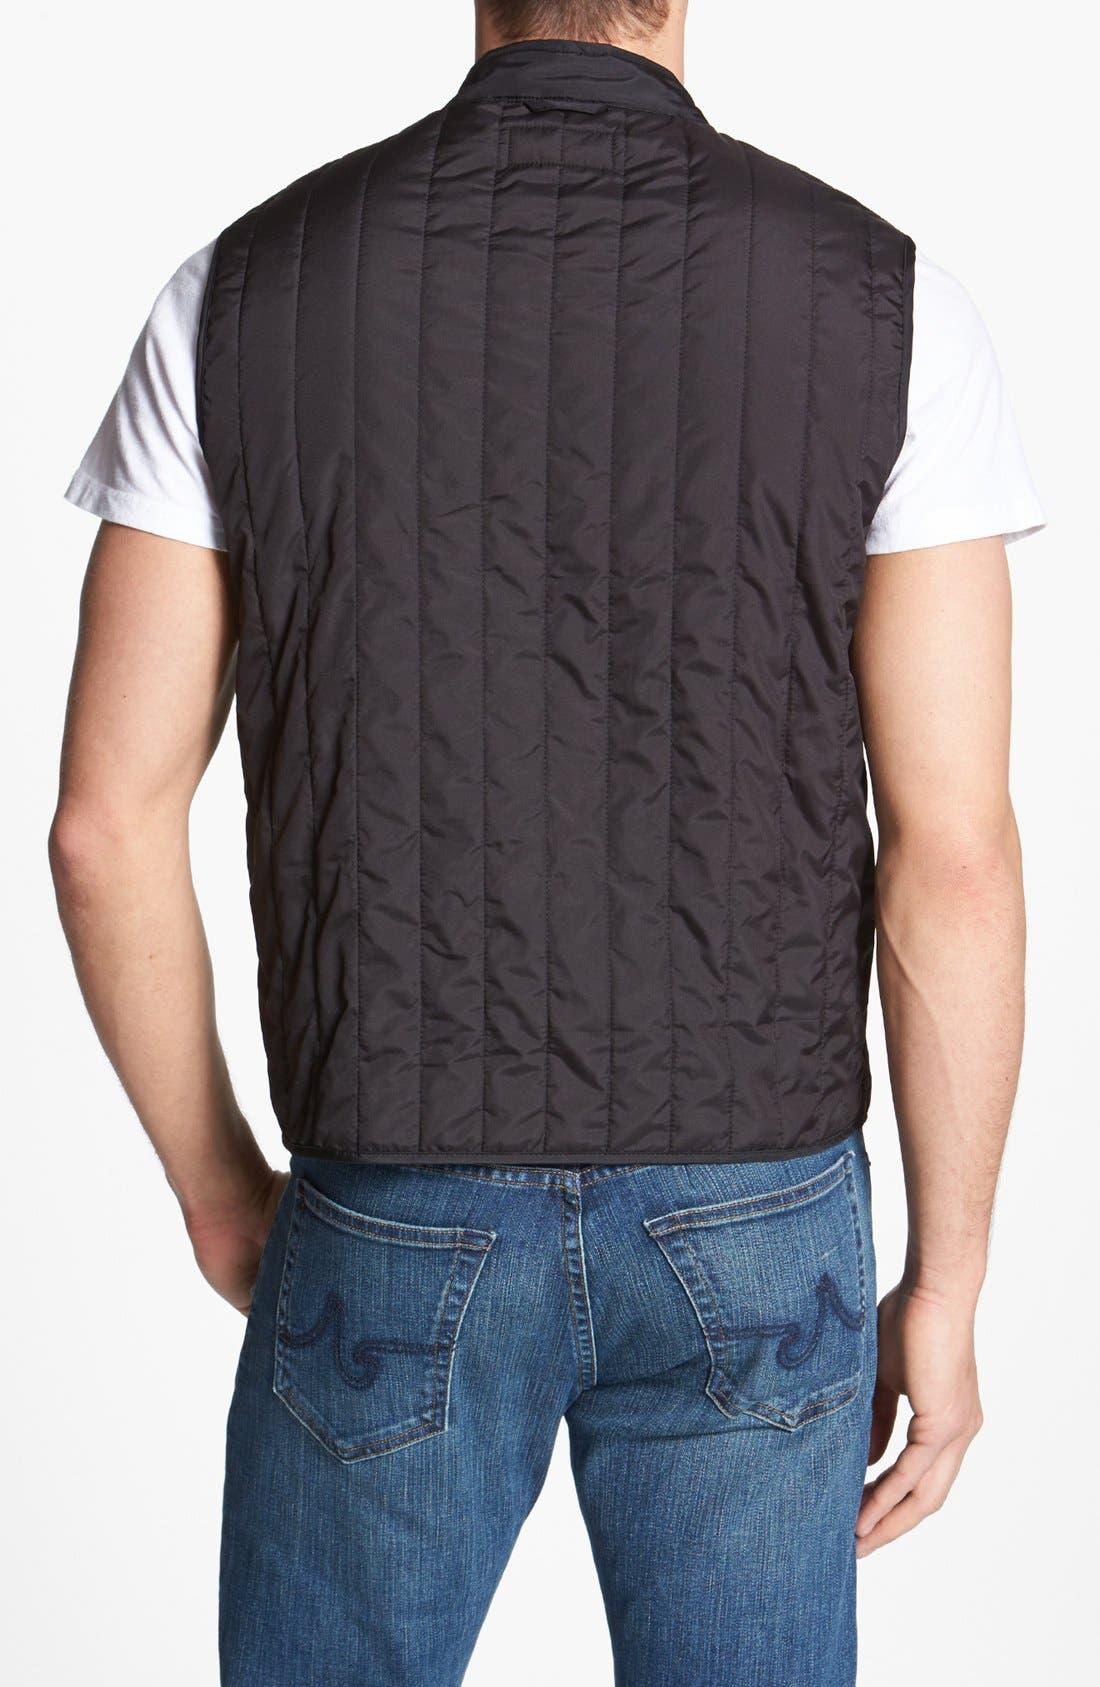 Alternate Image 4  - Michael Kors Trim Fit 3-in-1 Jacket